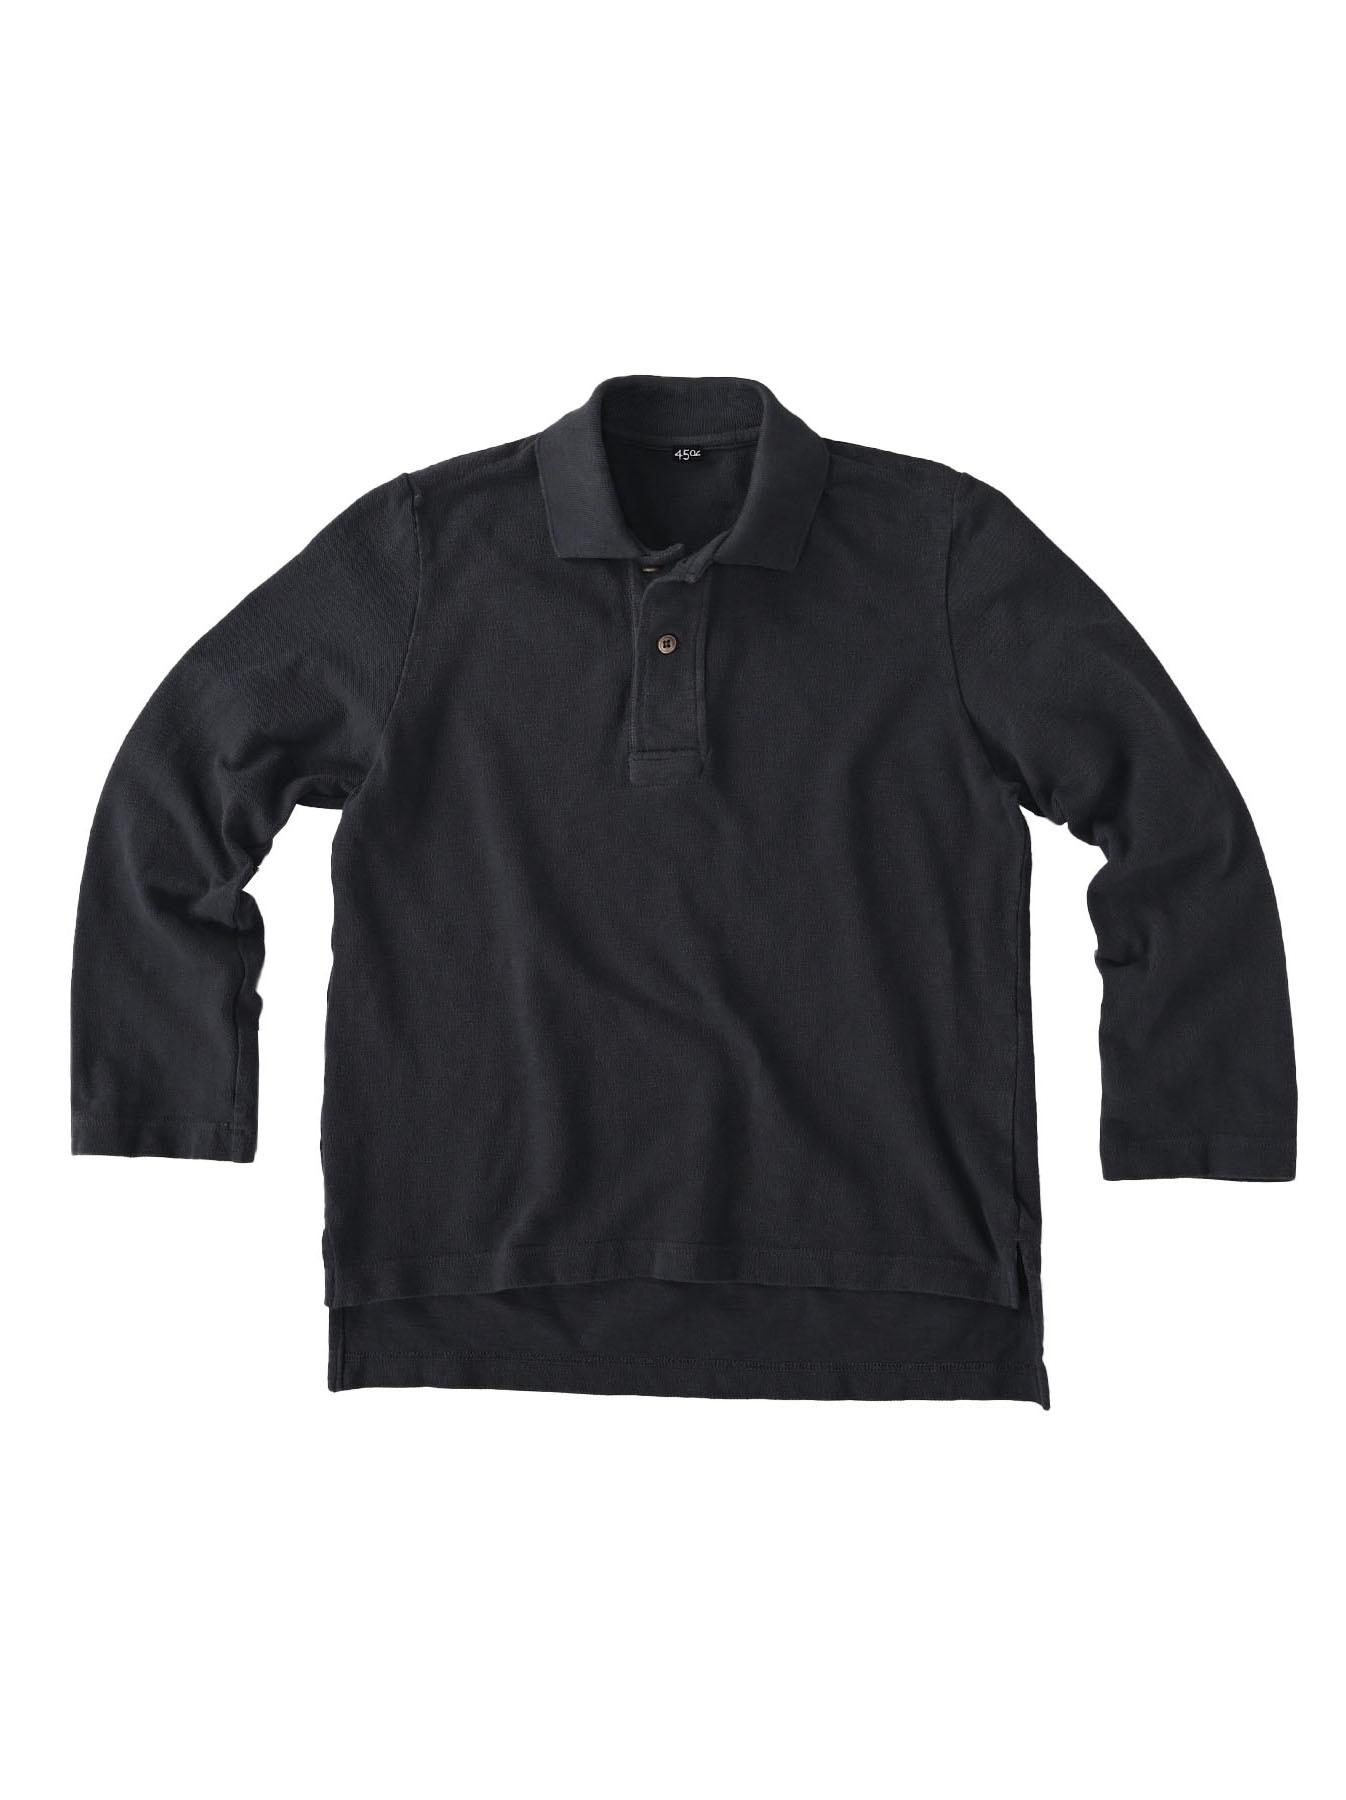 Kanoko Shiokaze Long-sleeved Square Polo Shirt (0521)-1